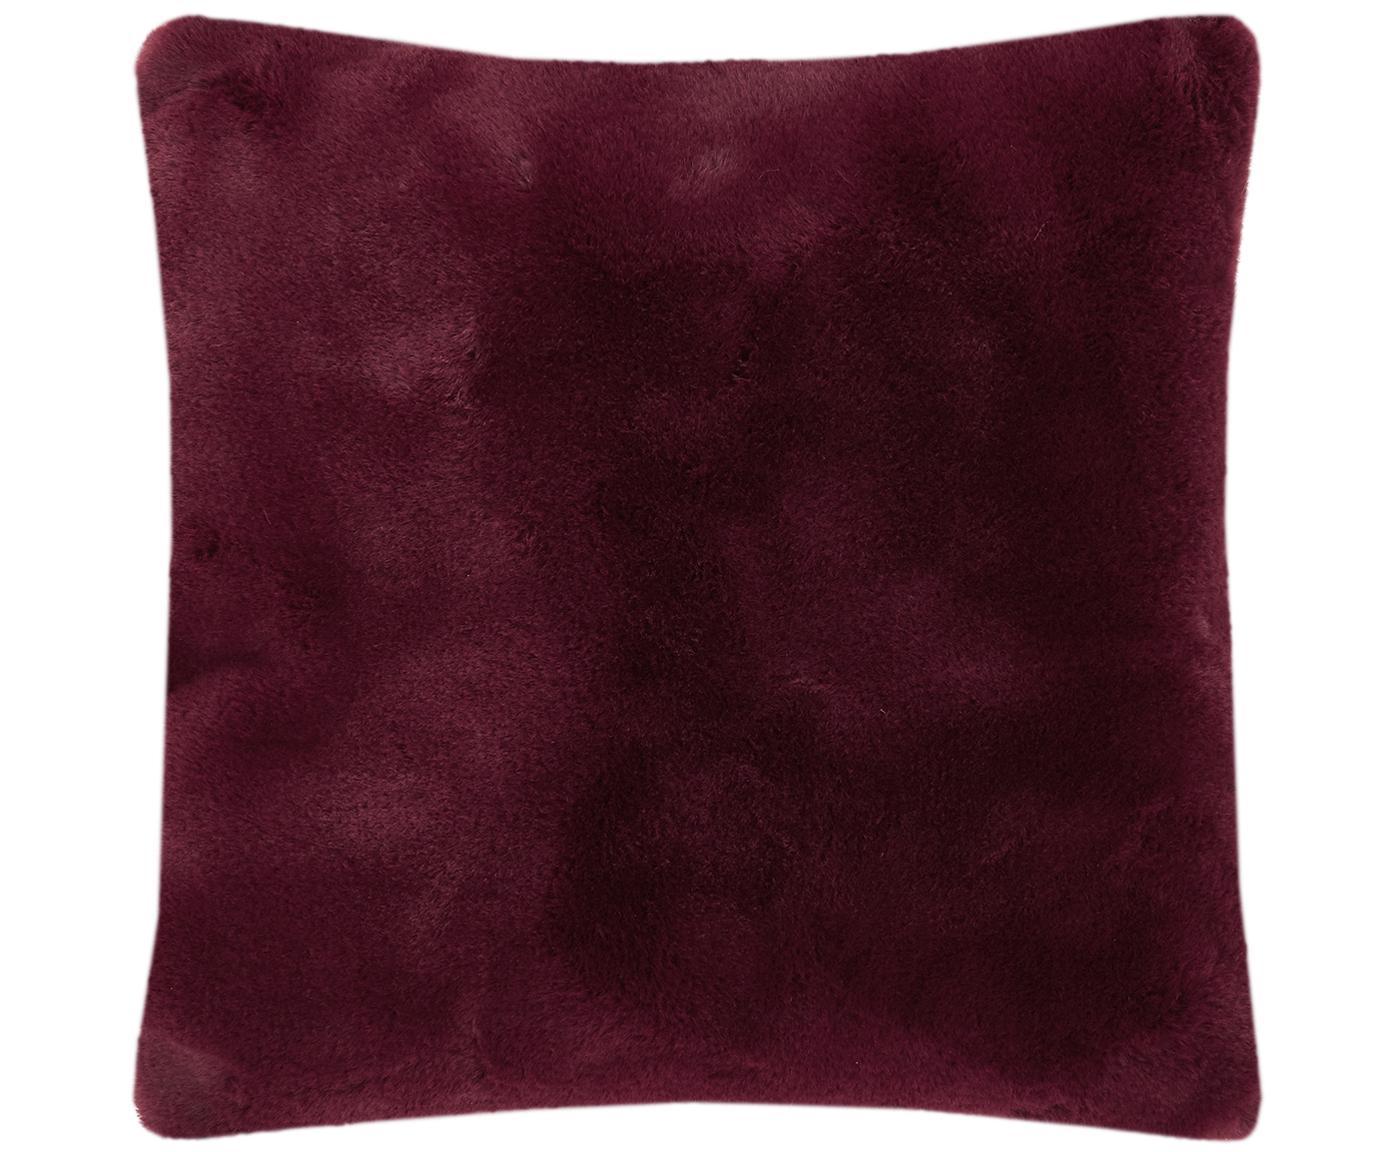 Sehr flauschige Kunstfell-Kissenhülle Mette, glatt, Vorderseite: 100% Polyester, Rückseite: 100% Polyester, Dunkelrot, 45 x 45 cm